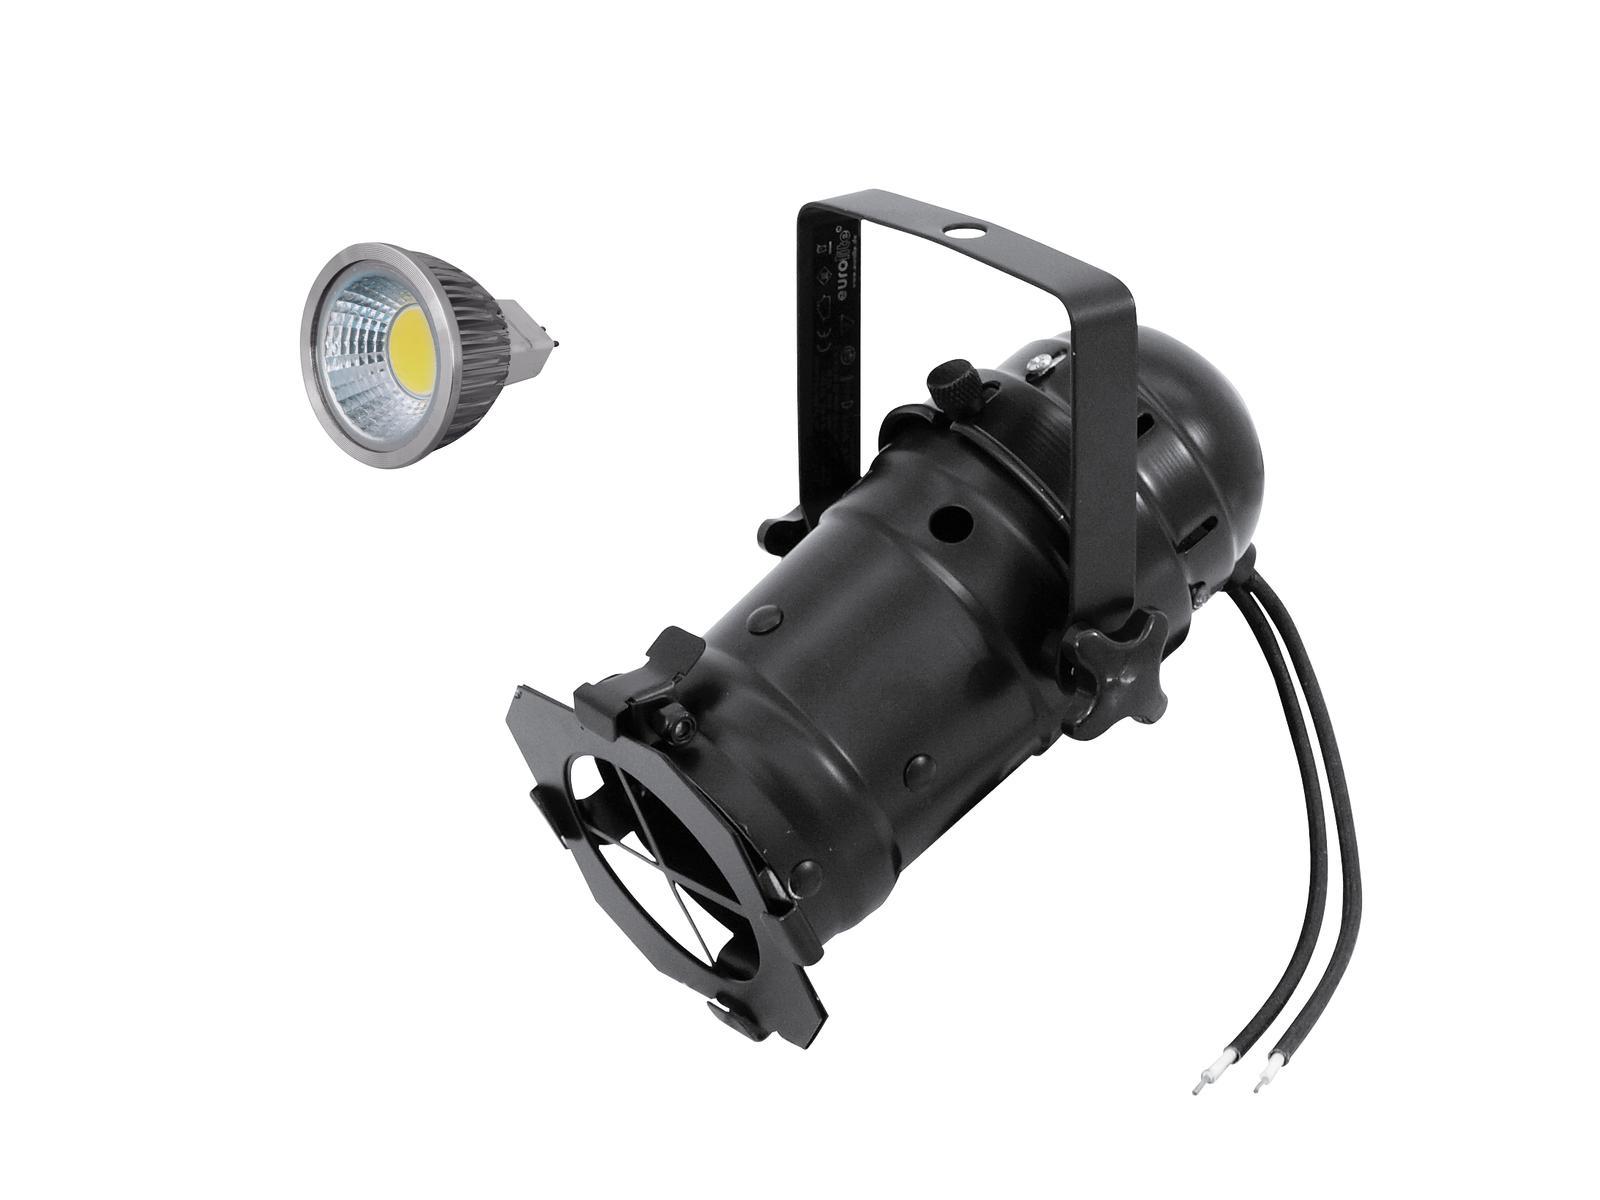 EUROLITE Impostare PAR-16 Spot bk + MR-16 12V GX-5,3 5W COB LED 3000K